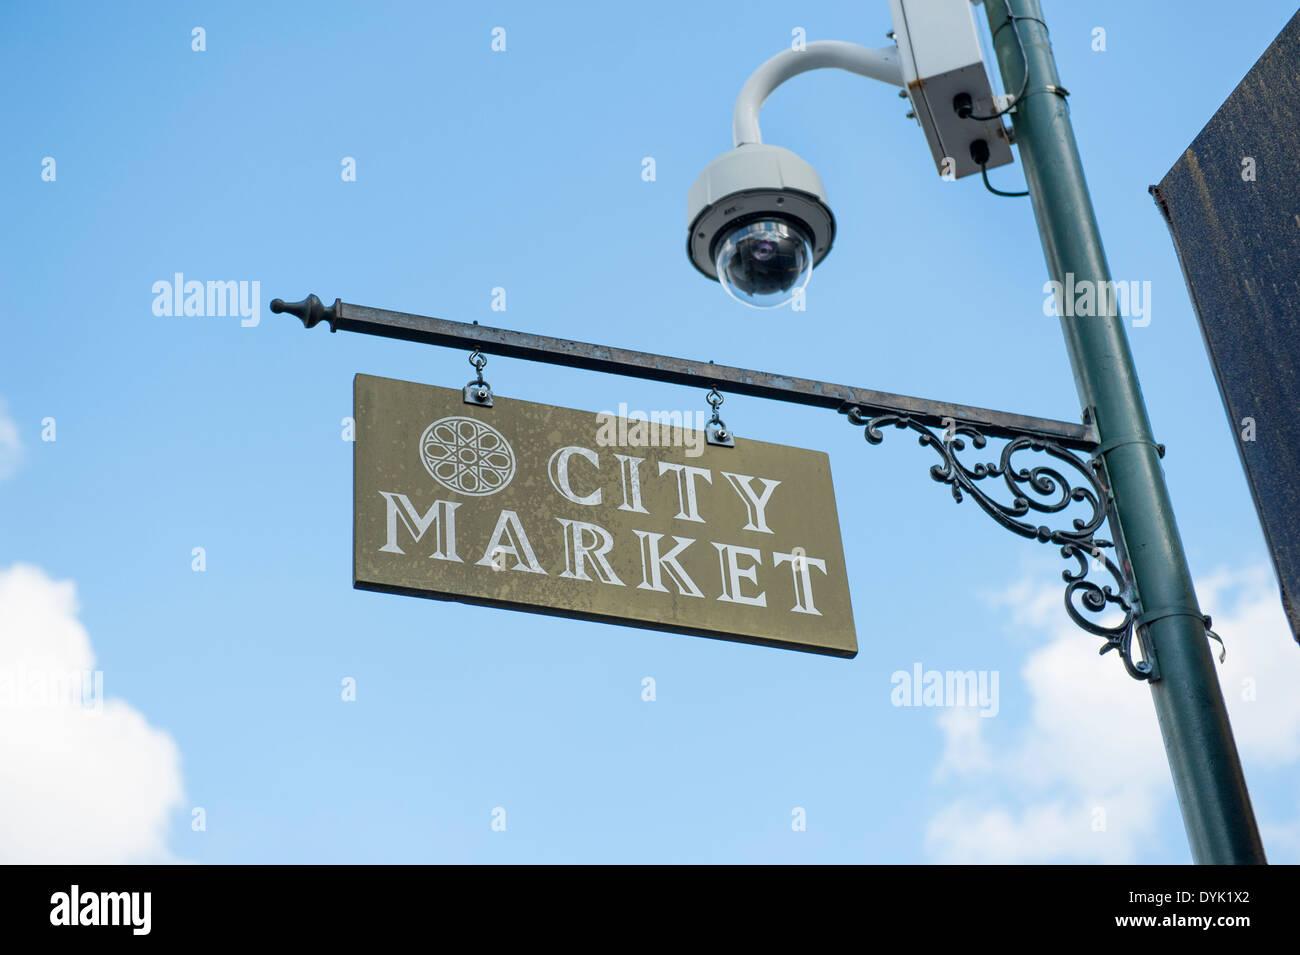 USA Public security safety surveillance overhead camera in the City Market of Savannah GA Georgia Stock Photo